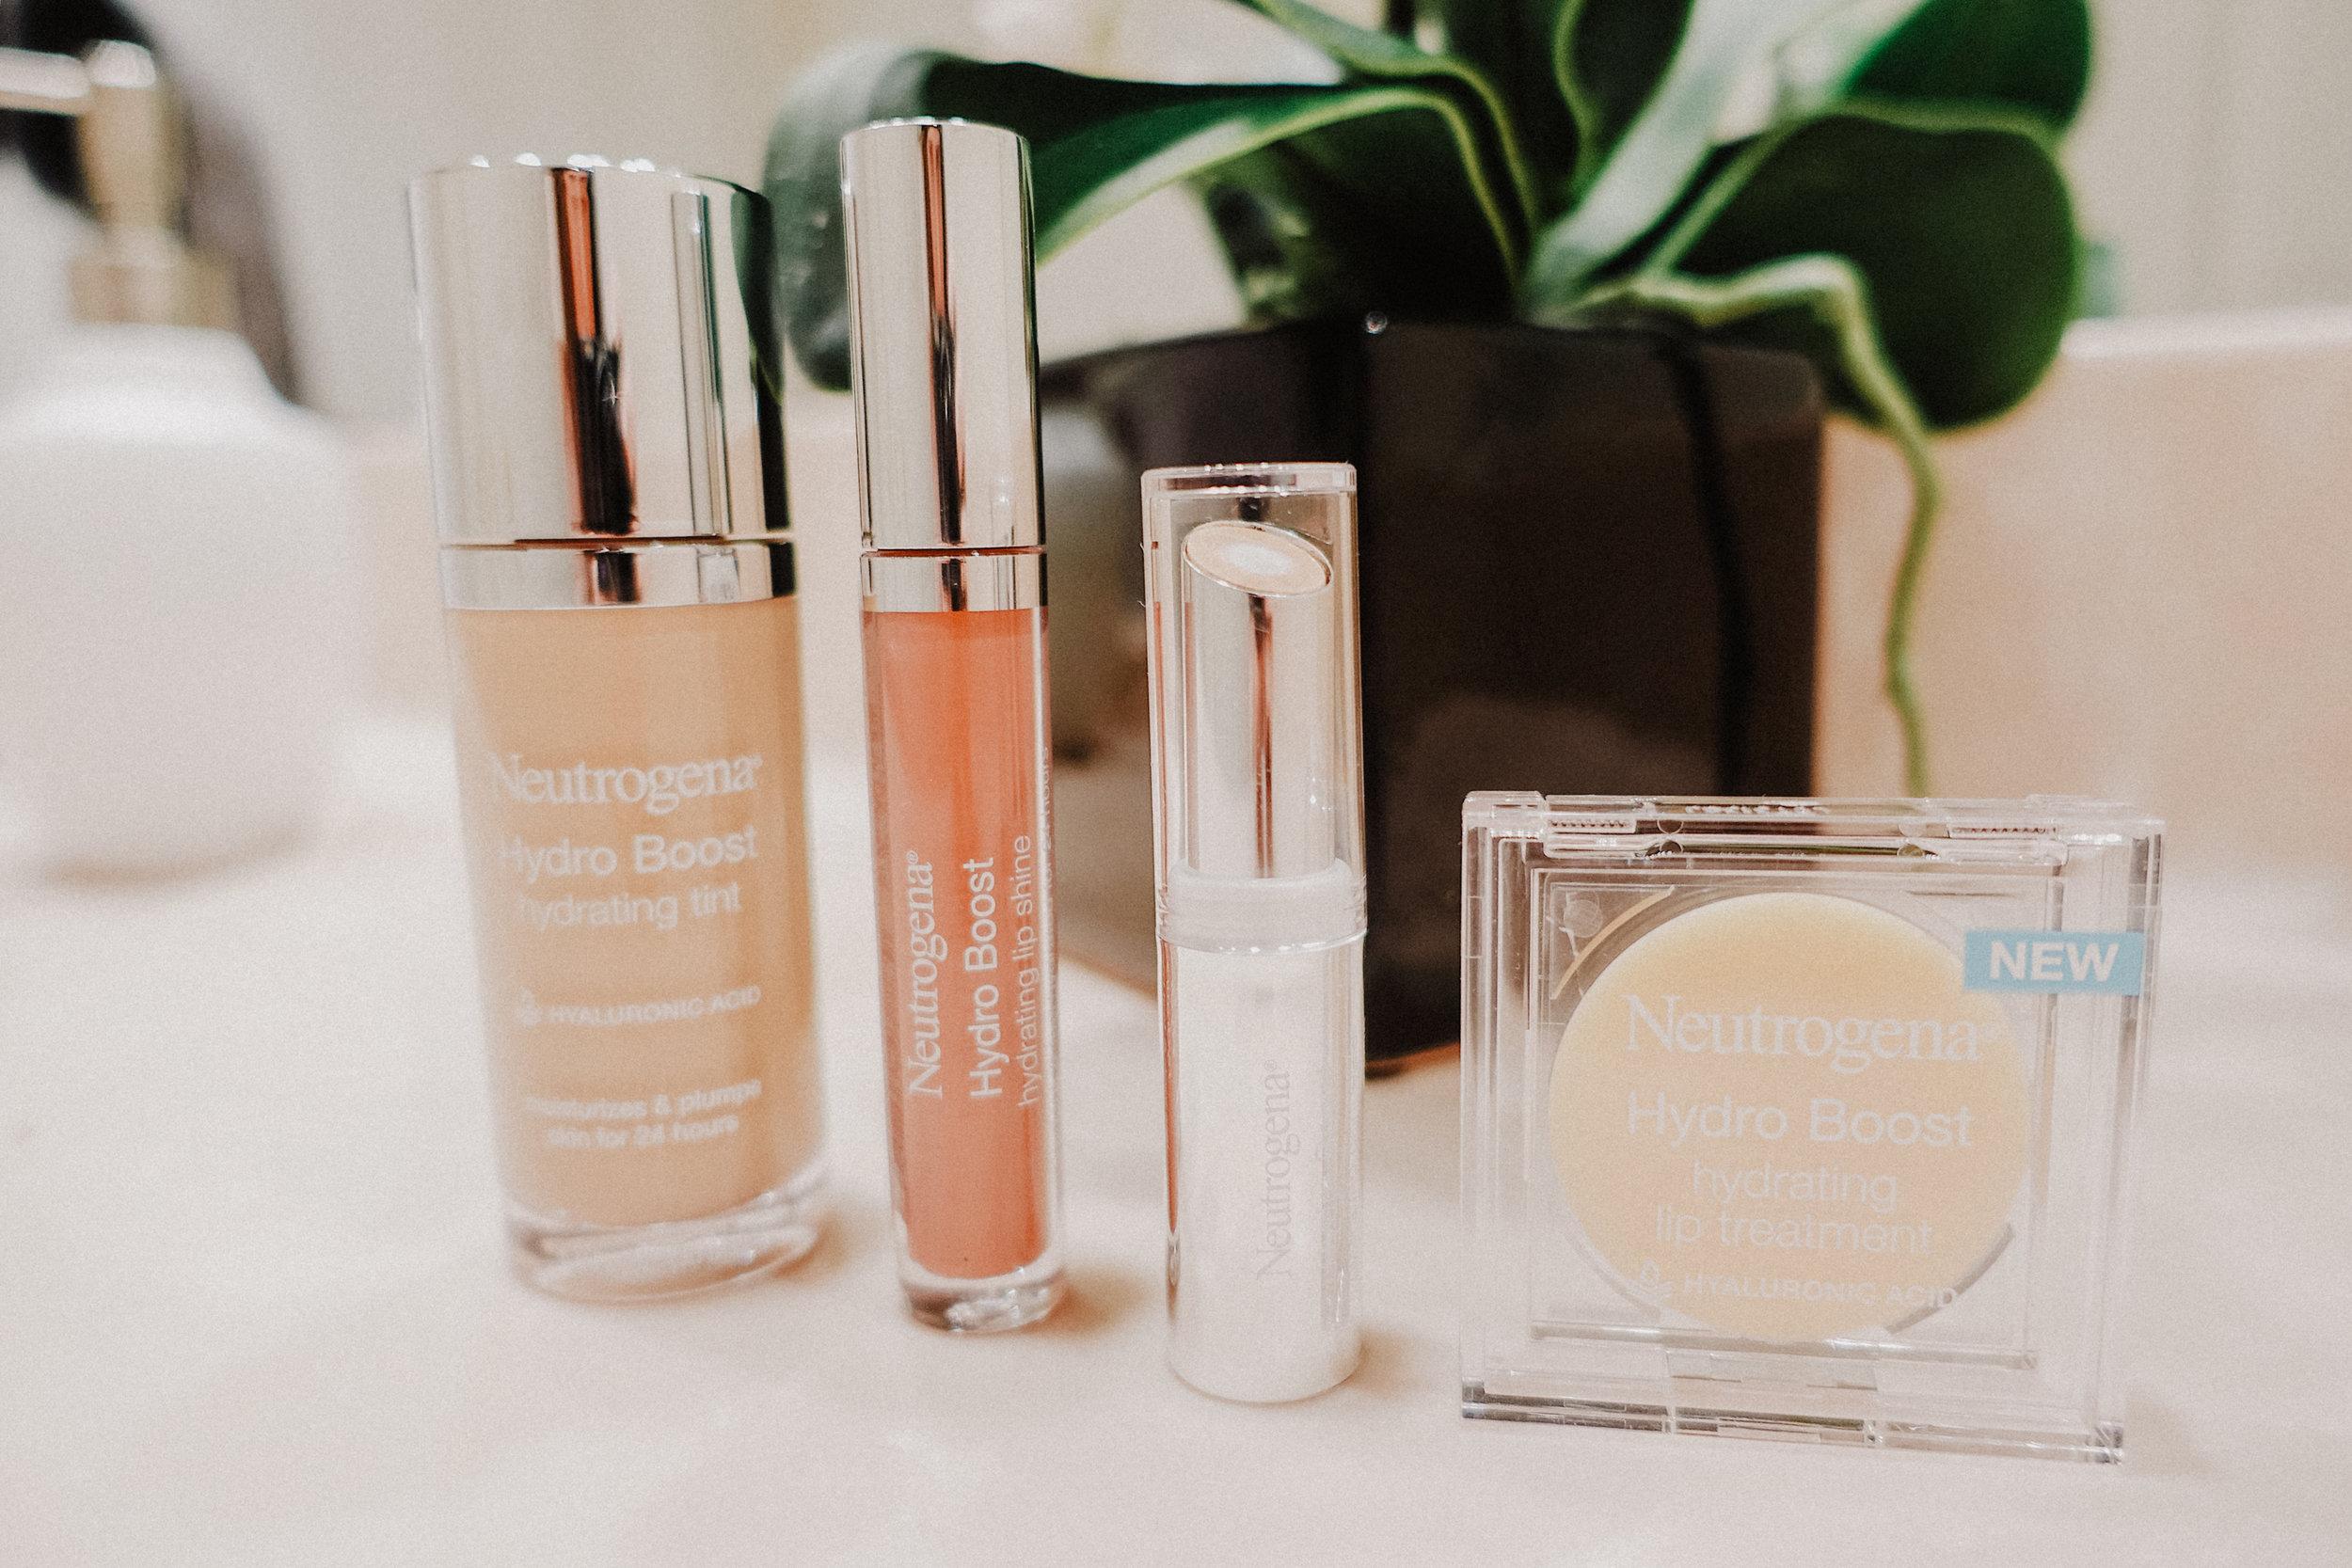 Neutrogena Hydro Boost Cosmetics